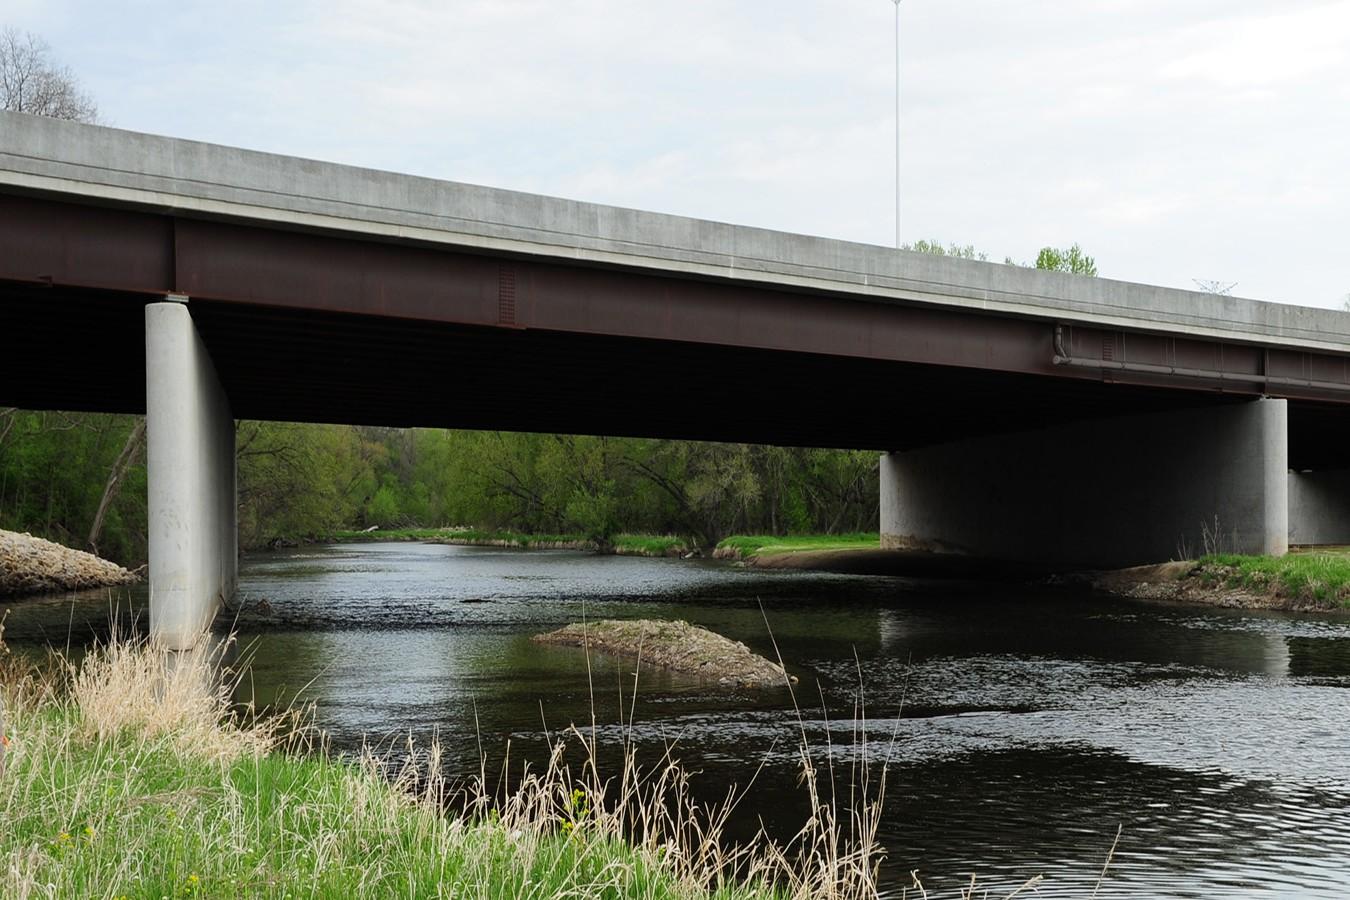 Jane Addams Memorial Tollway (I-90) over Kishwaukee River | Ciorba Group